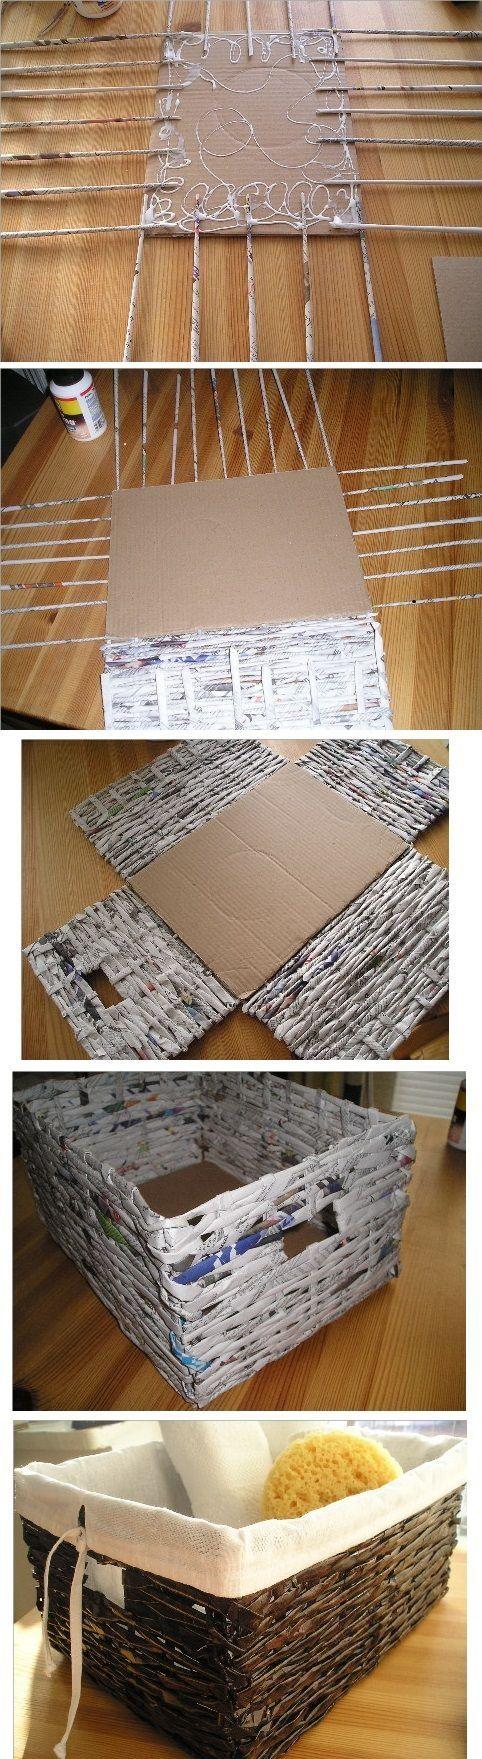 Detalles, canastos de papel,: